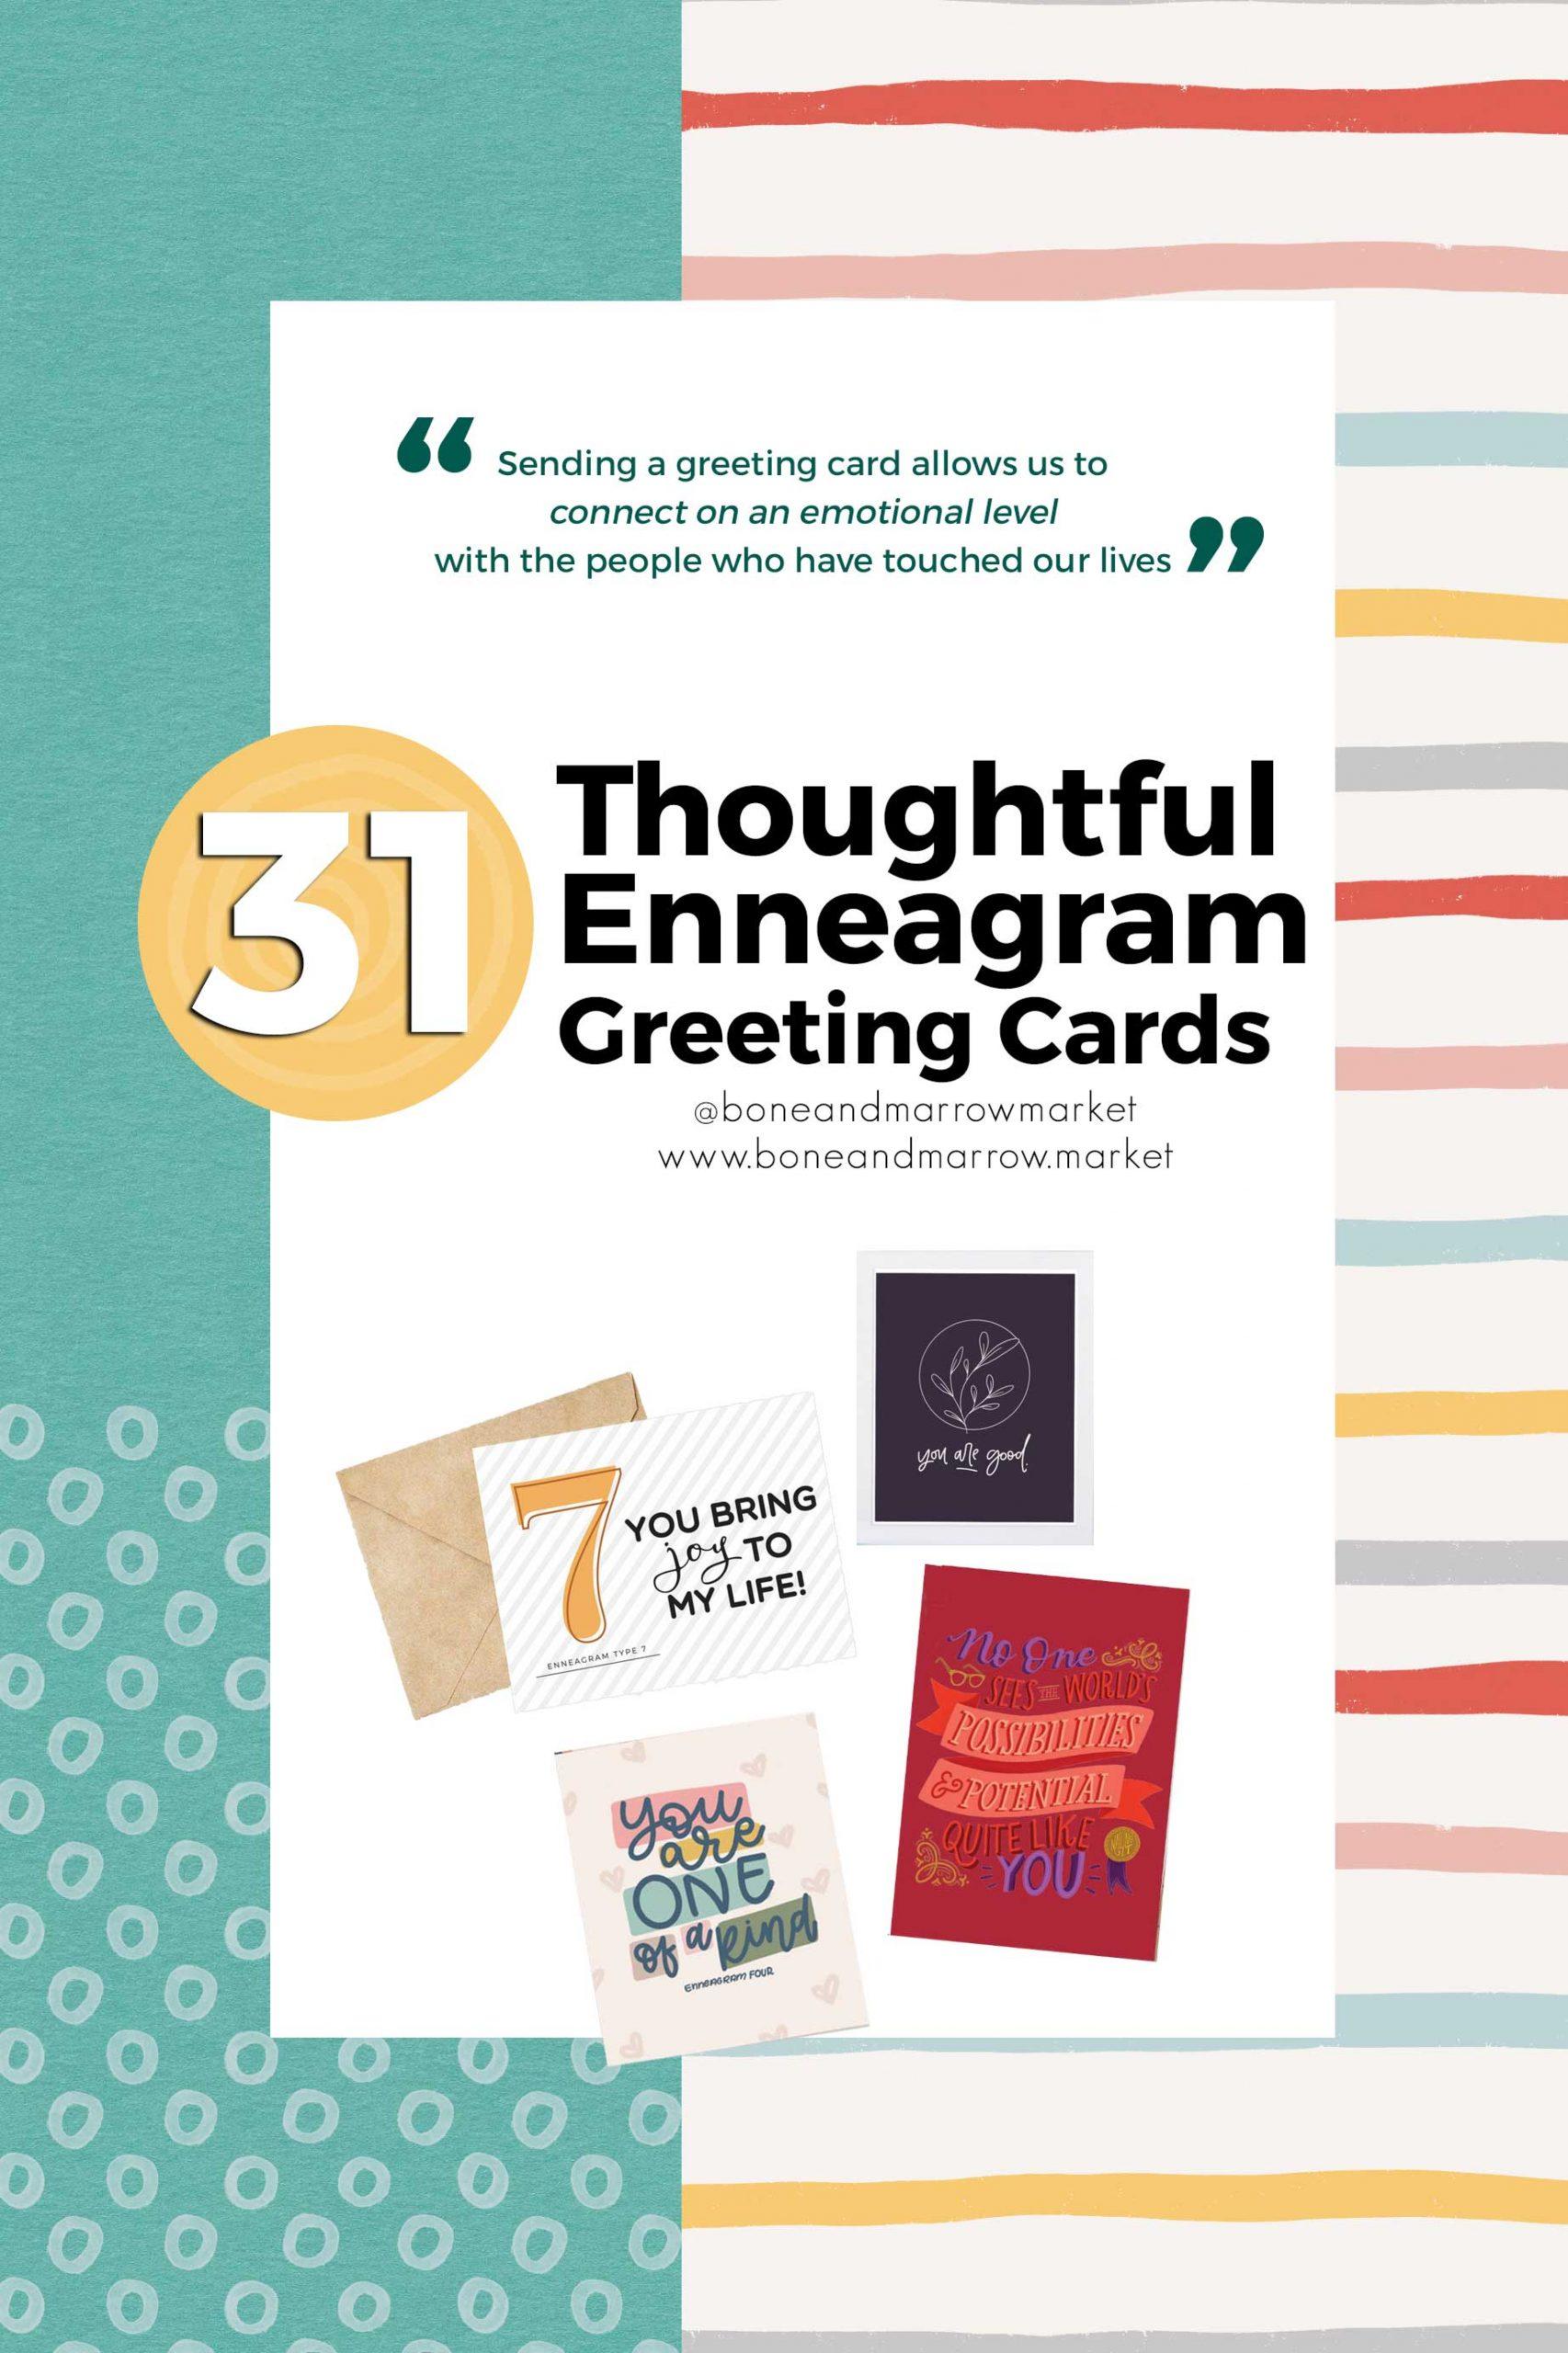 Enneagram Greeting Cards